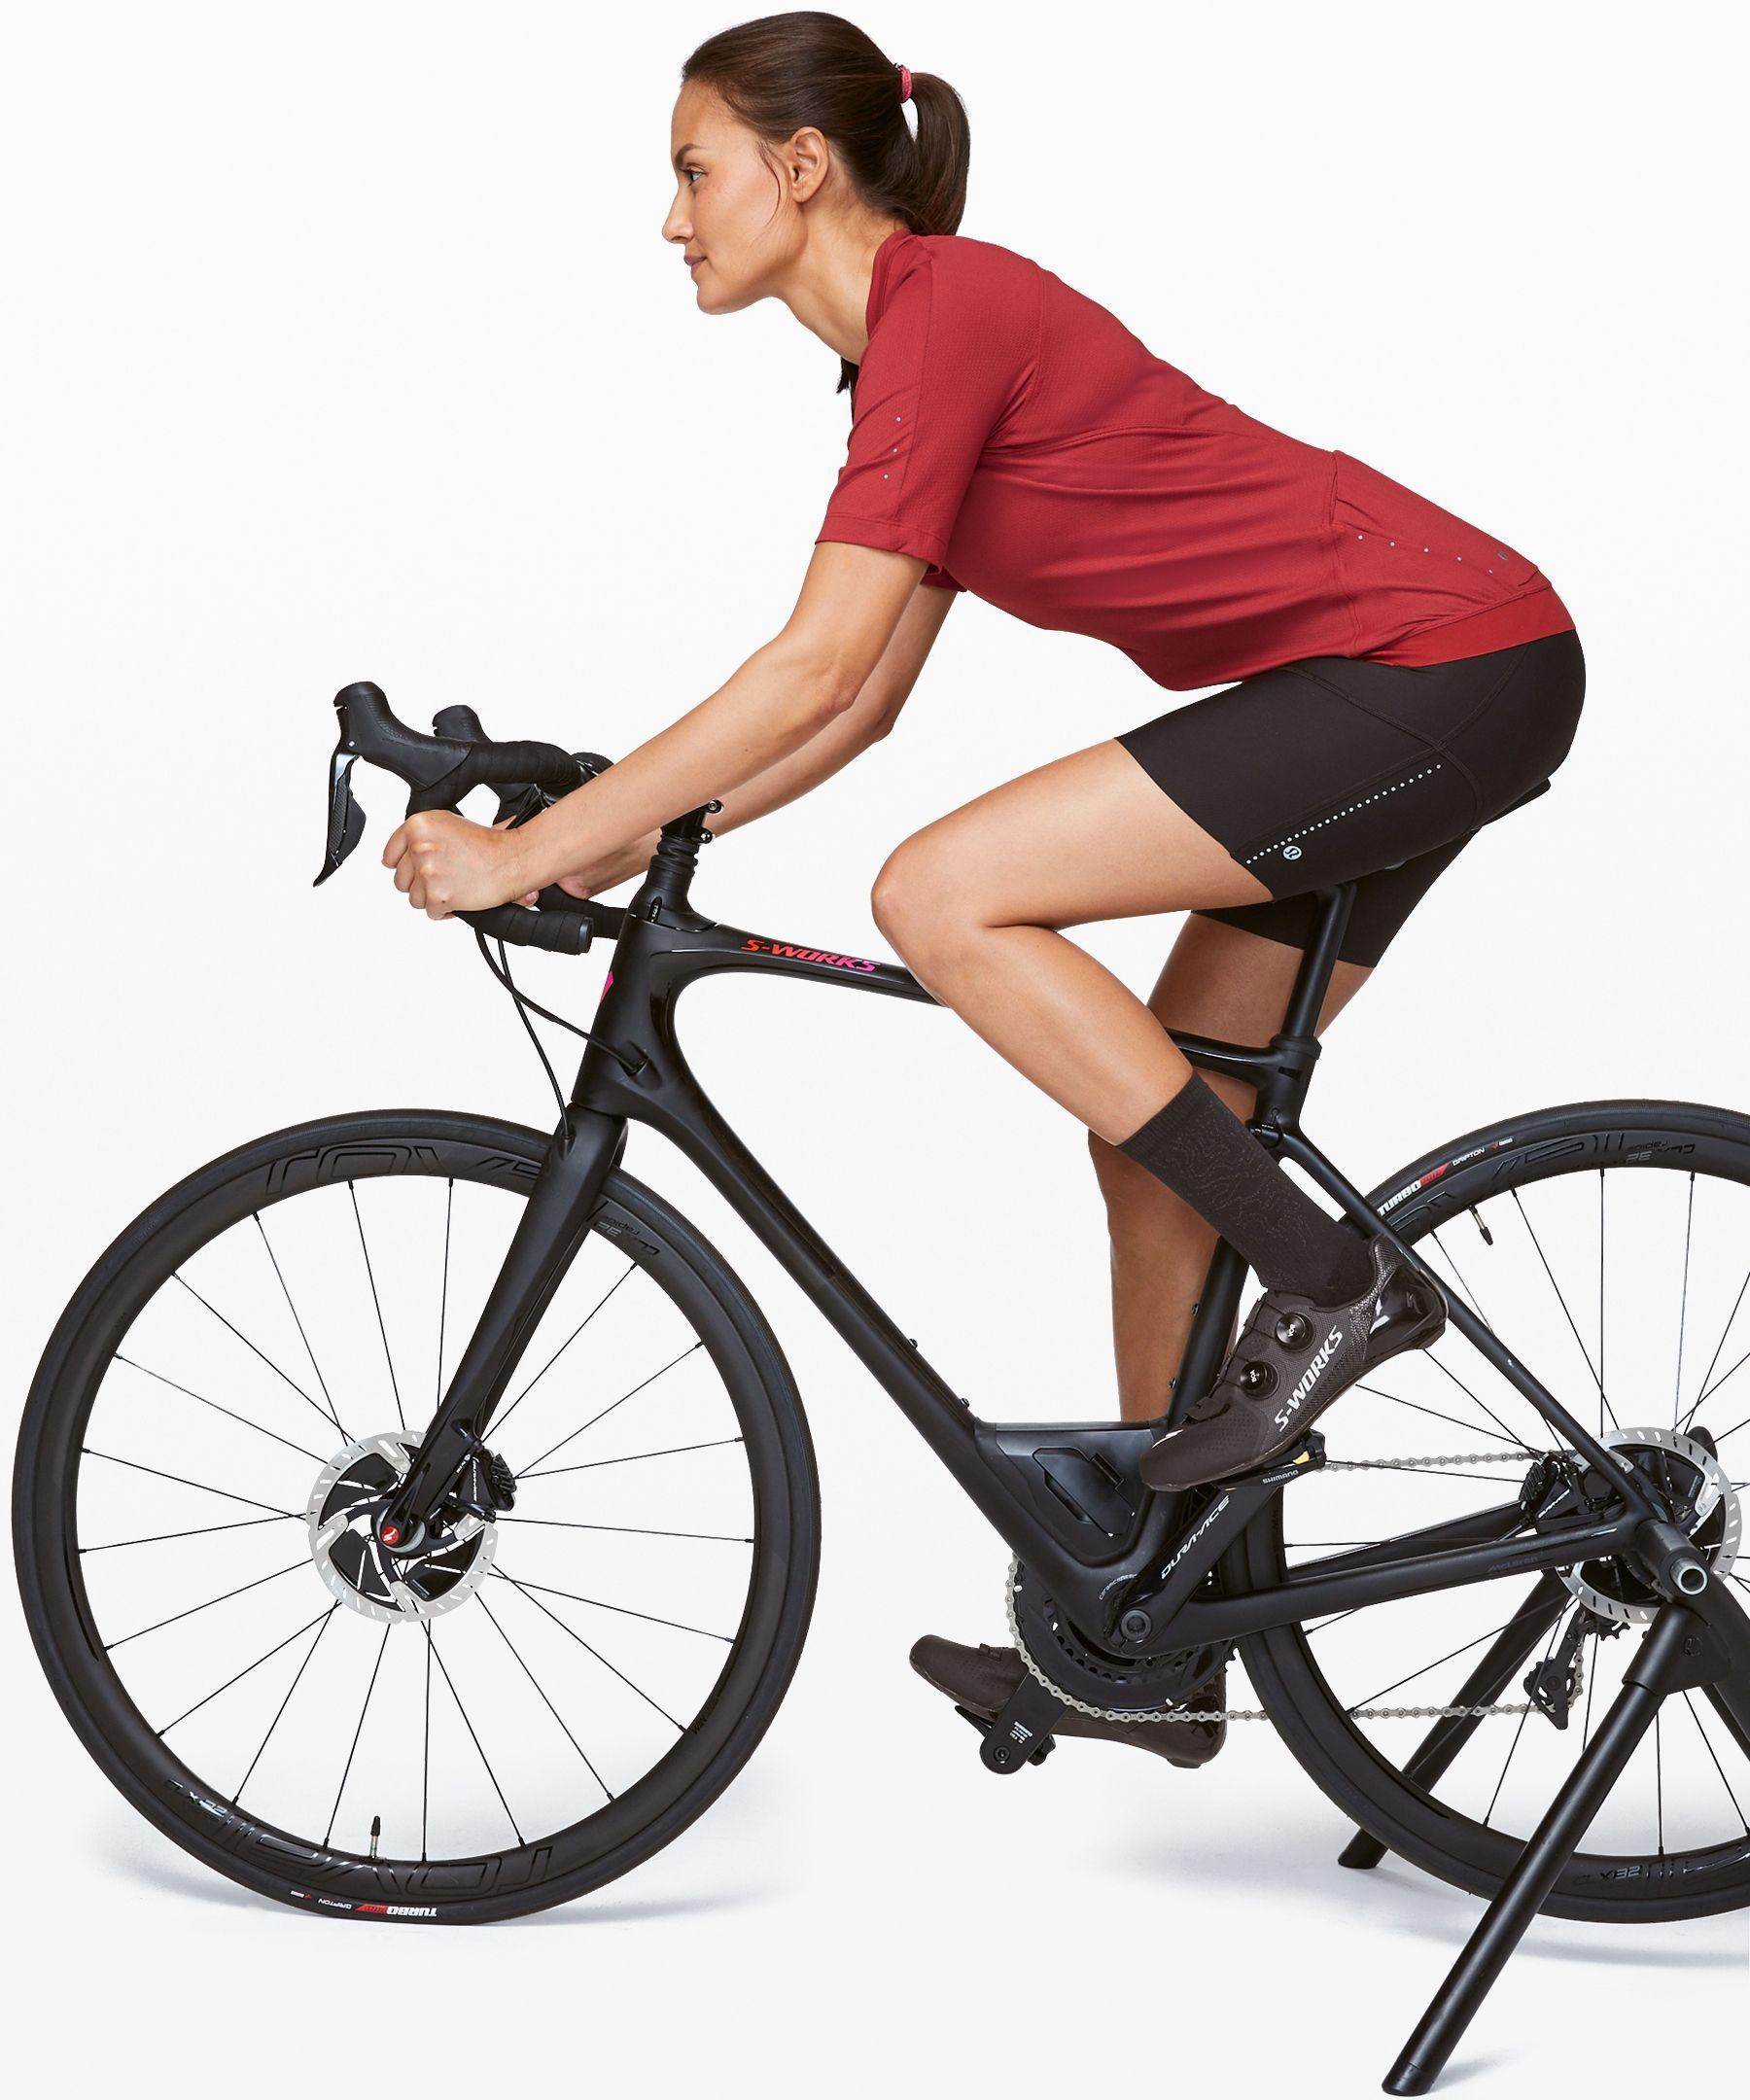 Lululemon Women S City To Summit Cycling Jersey Cayenne Size Xs Women S Cycling Jersey Sleeves Short Sleeves